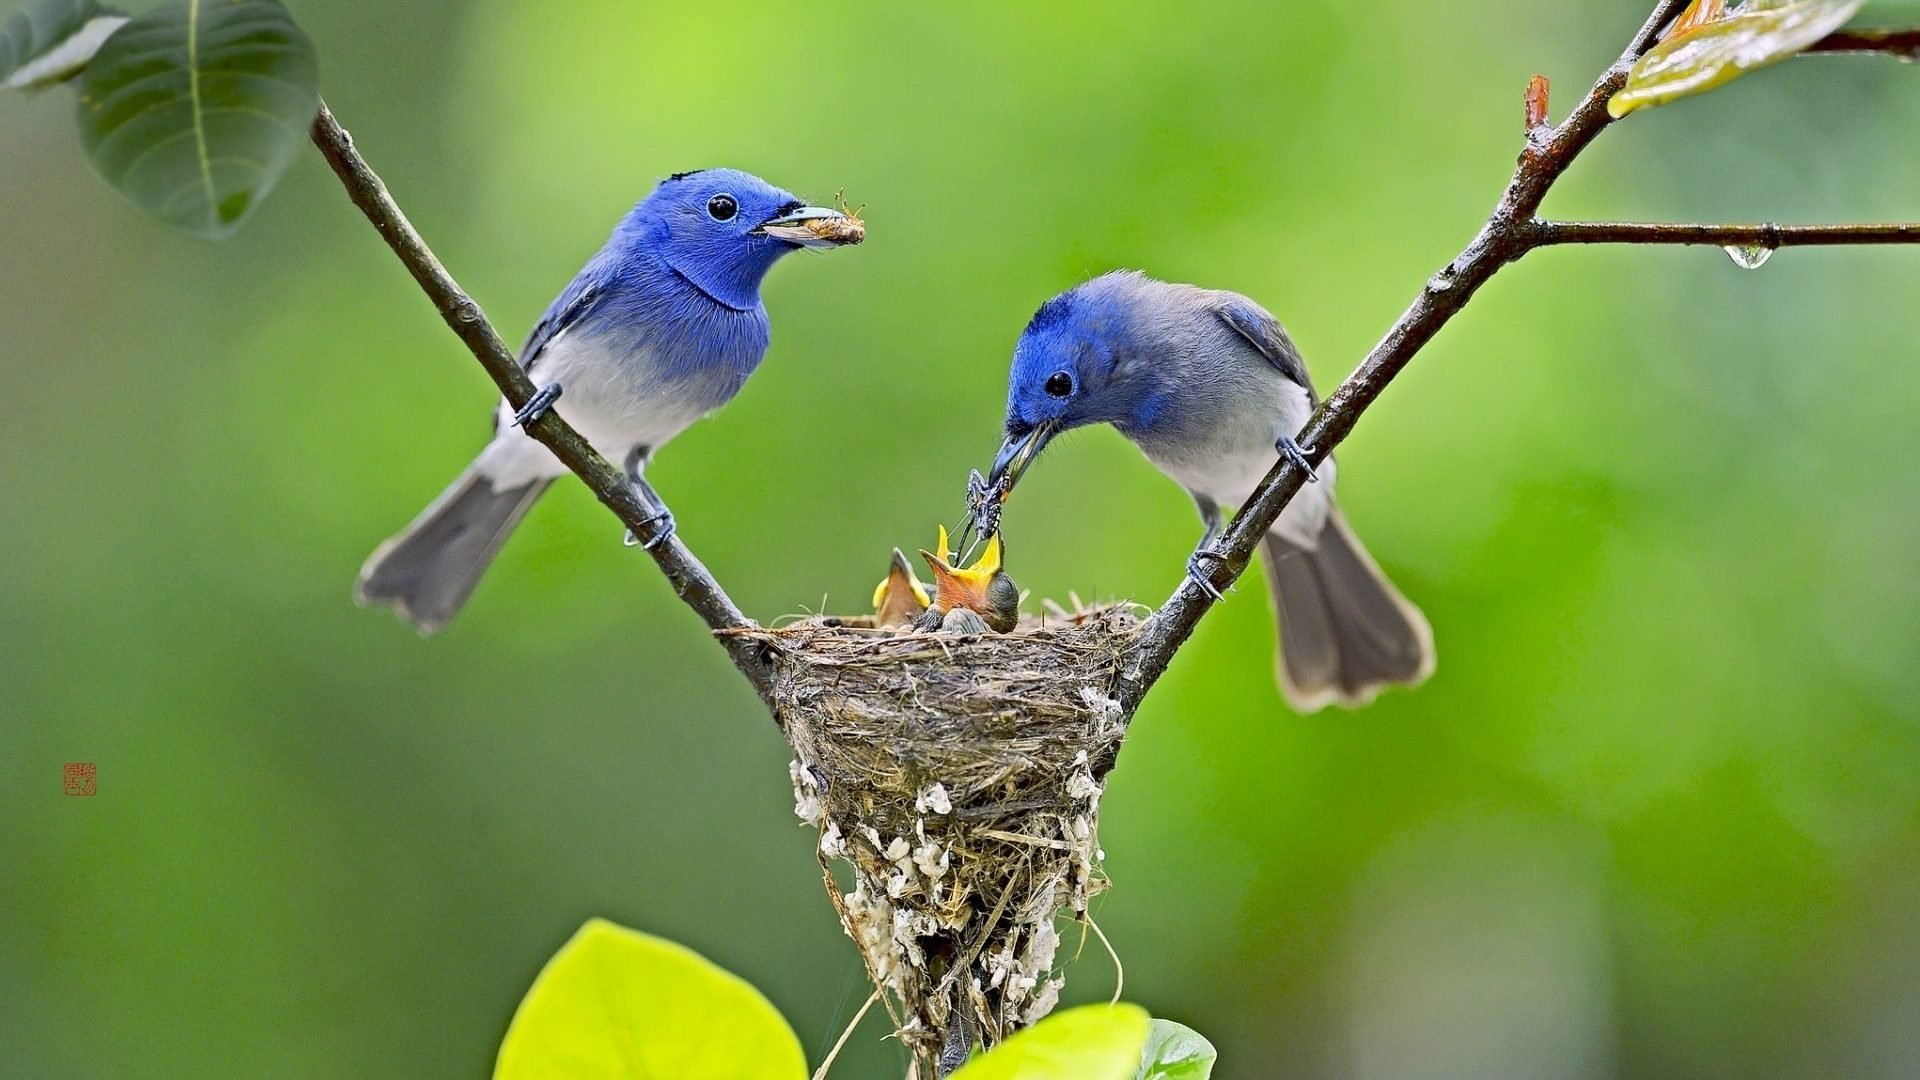 Birds Feeding Their Babies HD Wallpaper